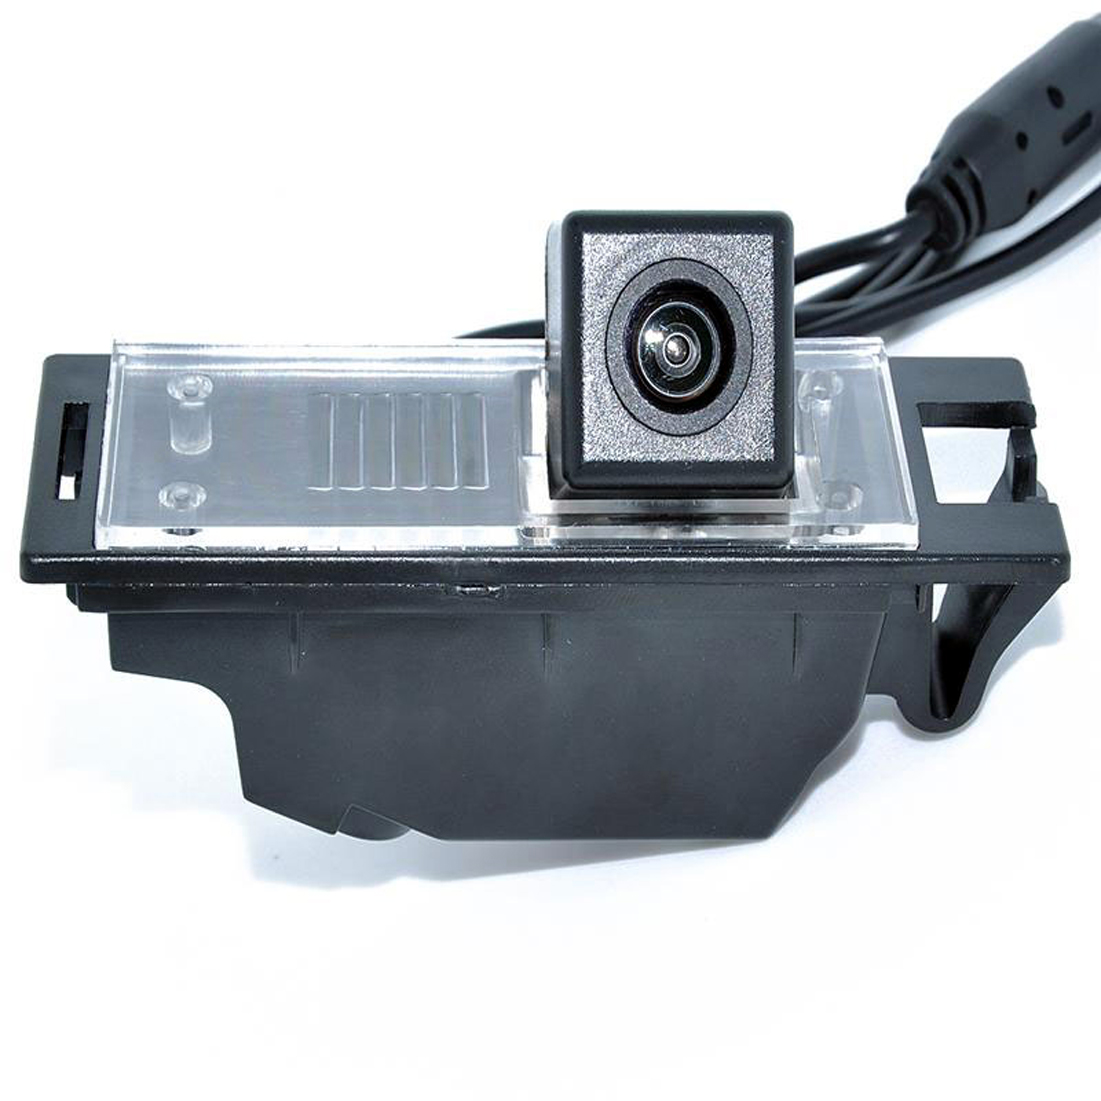 CCD Автомобильная камера заднего вида, камера заднего вида для парковки для Hyundai IX35 с широким углом обзора